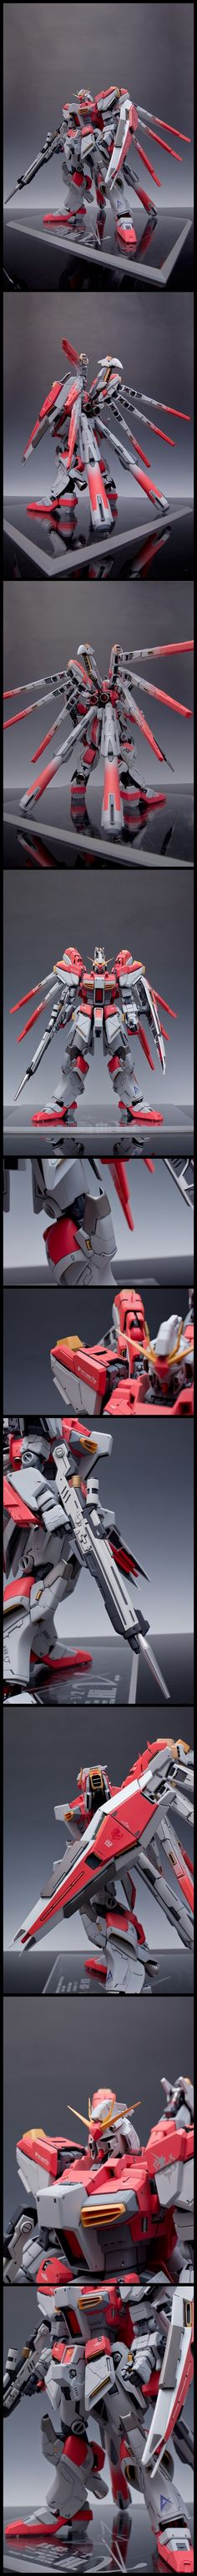 G-sys 1/72 Hi-Nu Gundam | The Plastic Figure World